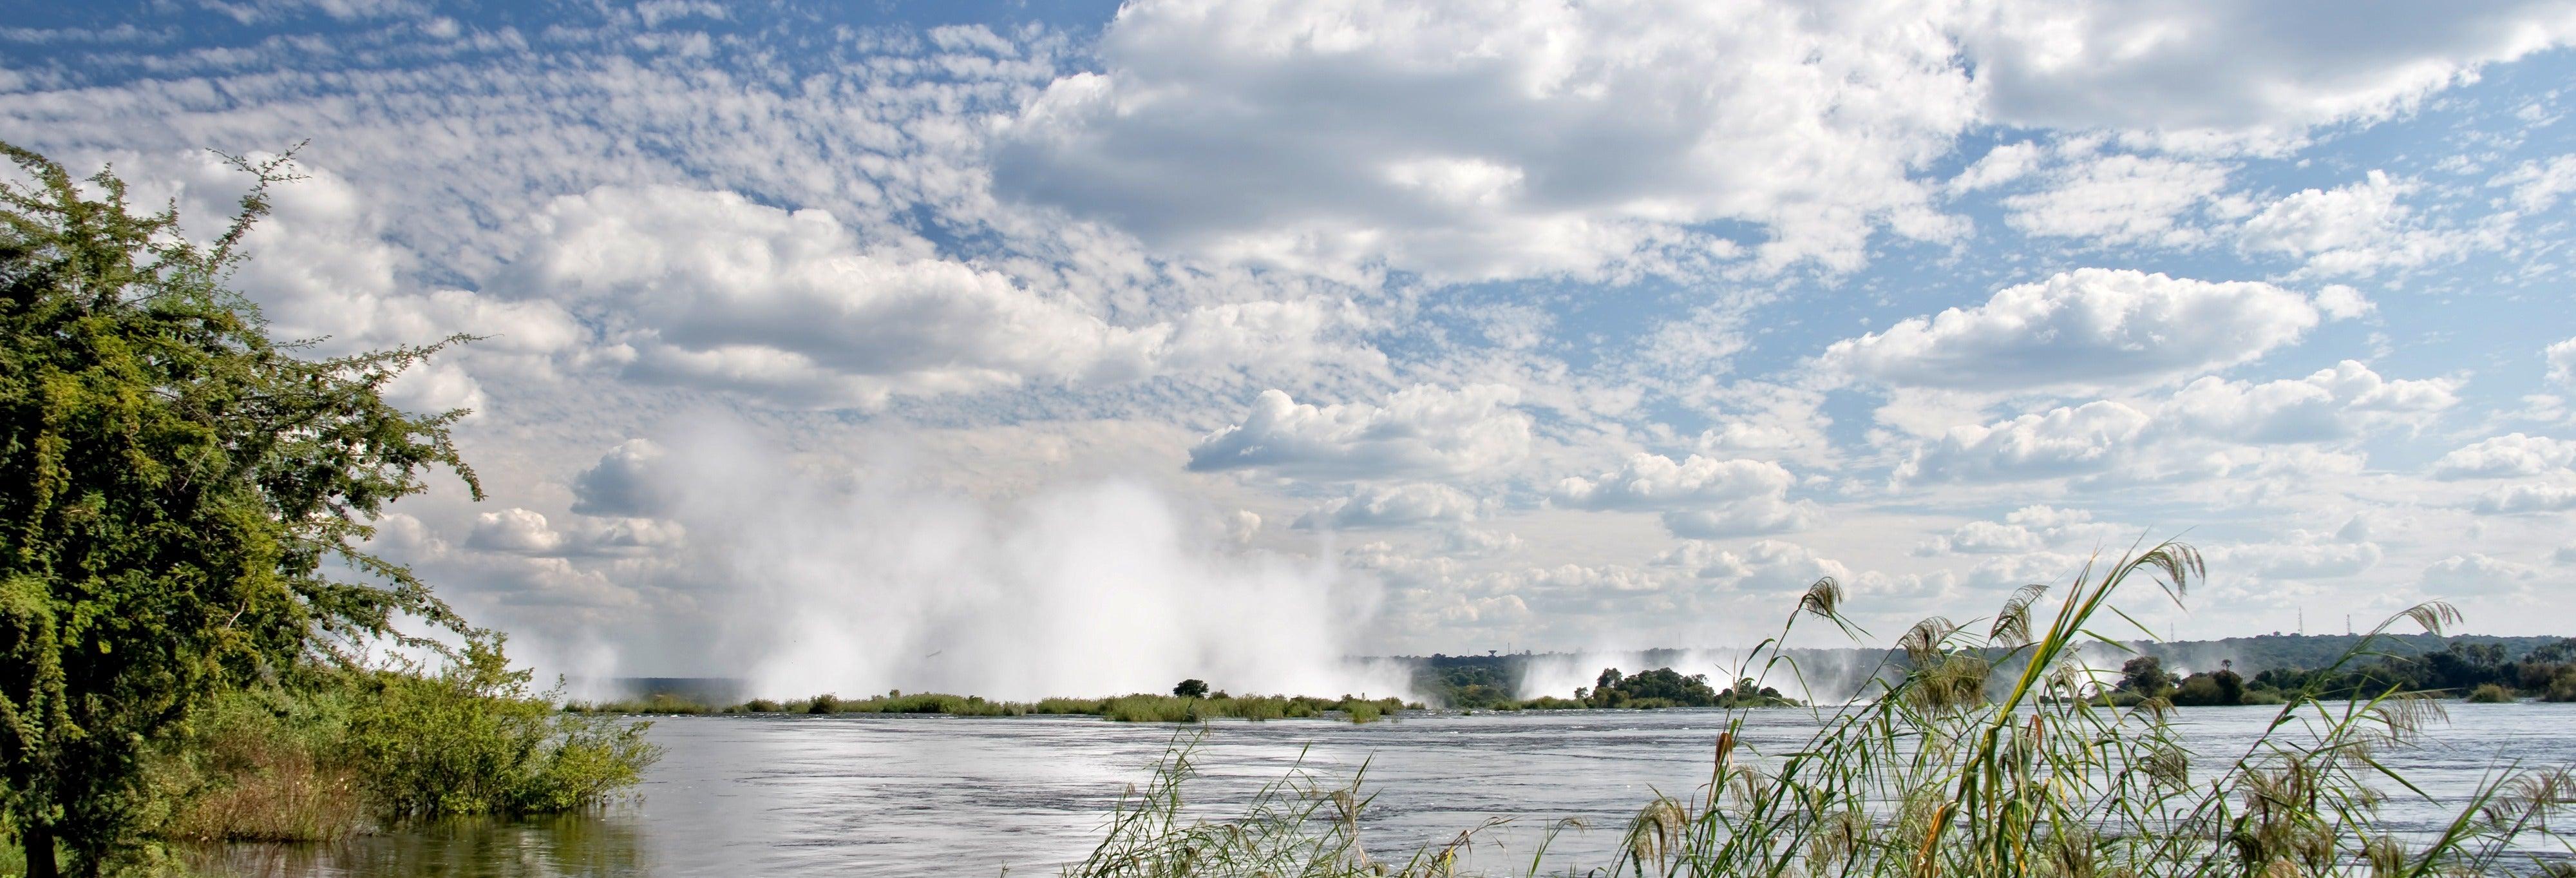 Rafting en el río Zambeze